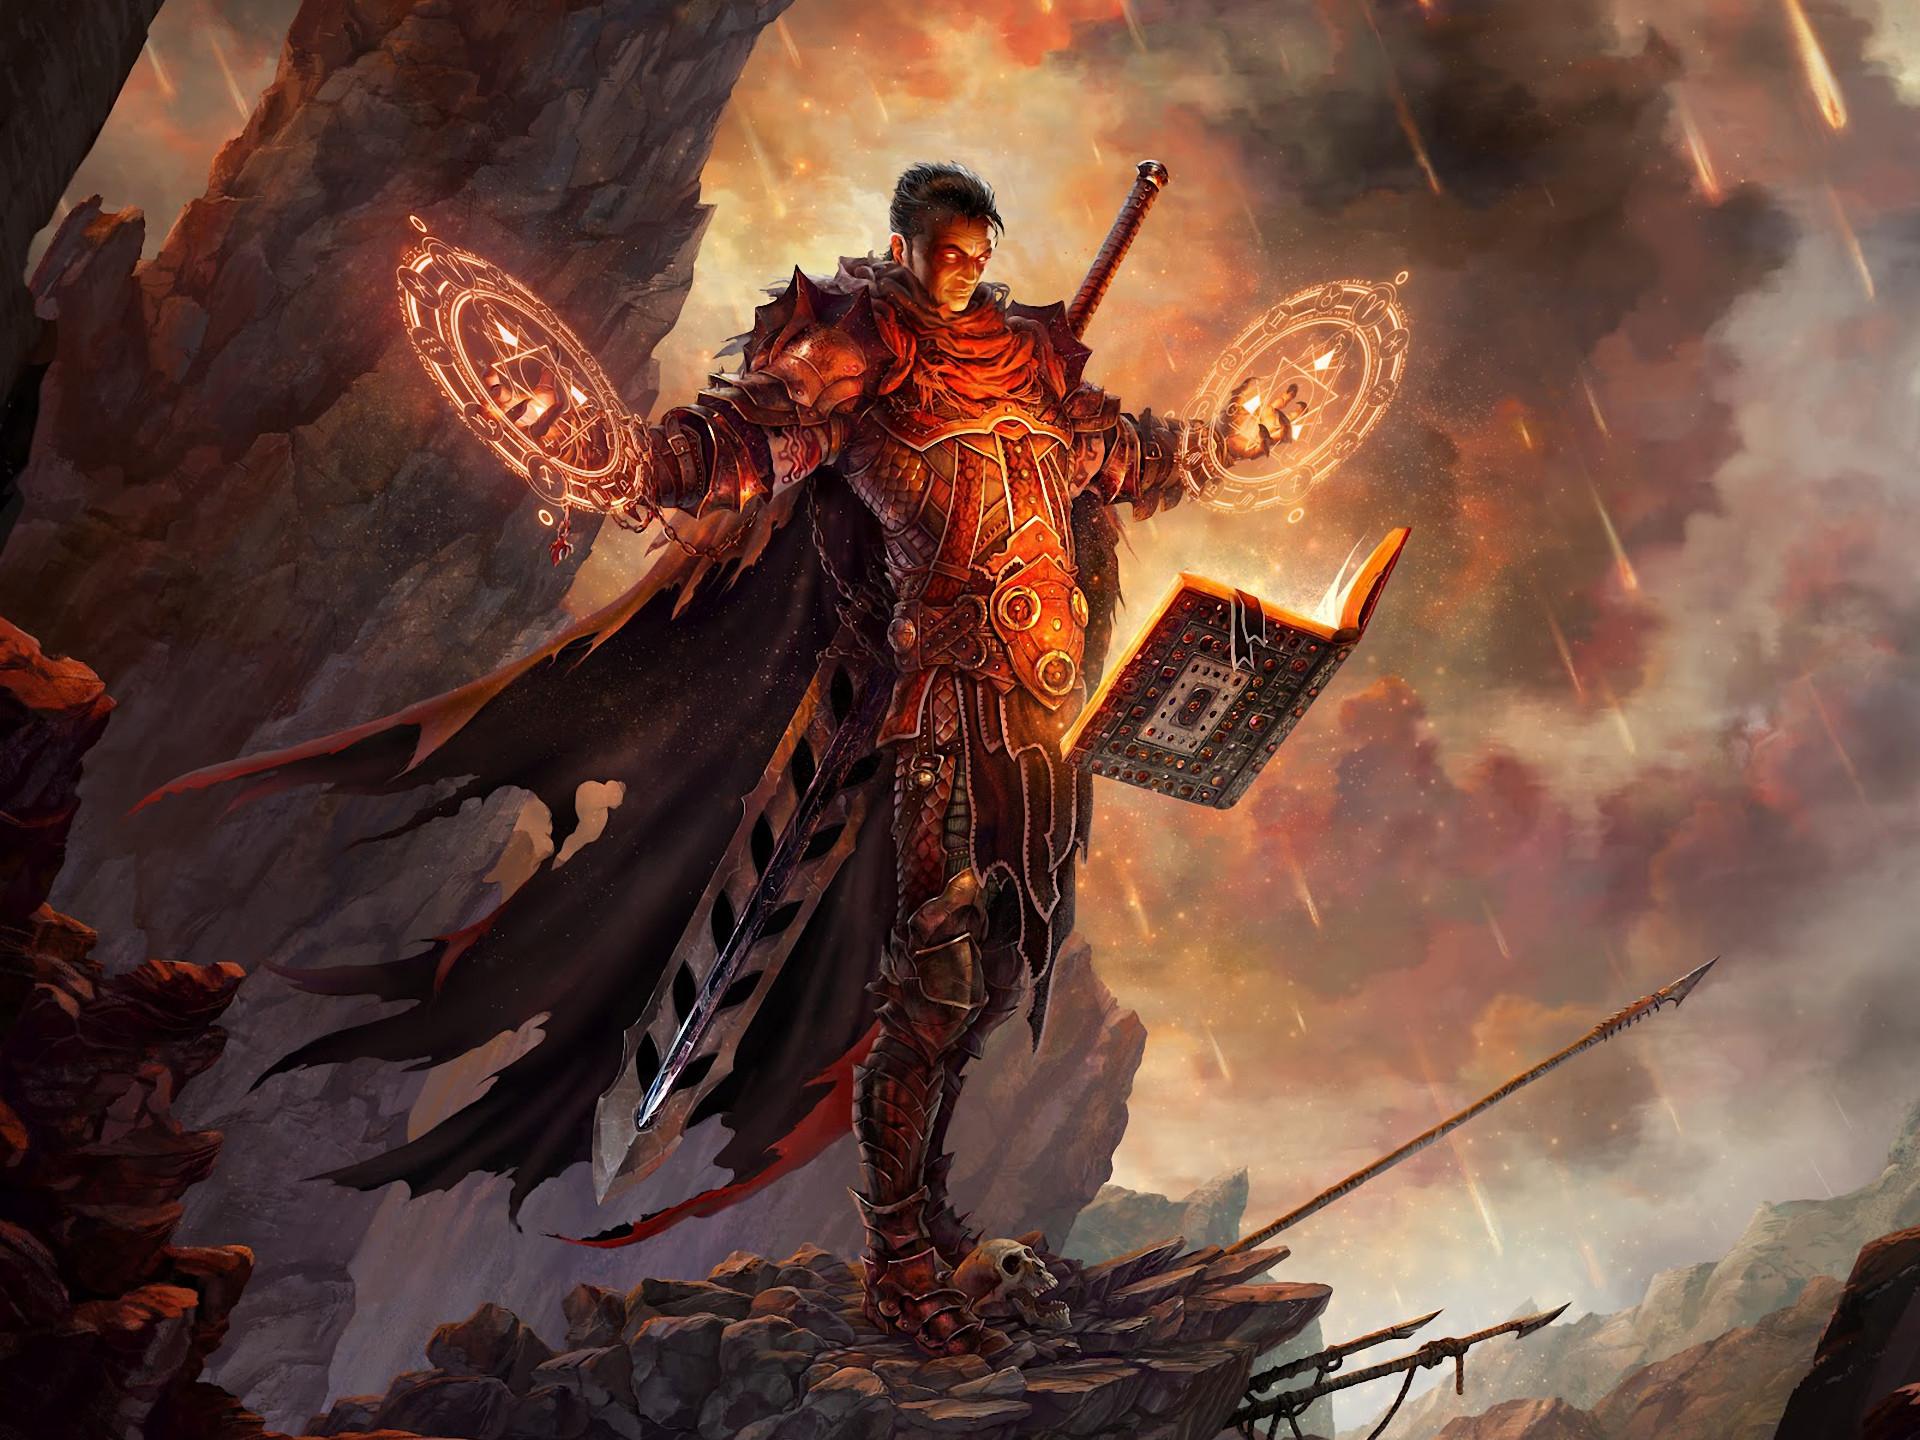 Fantasy Sorcerer Mage Warrior Fantasy Wallpaper